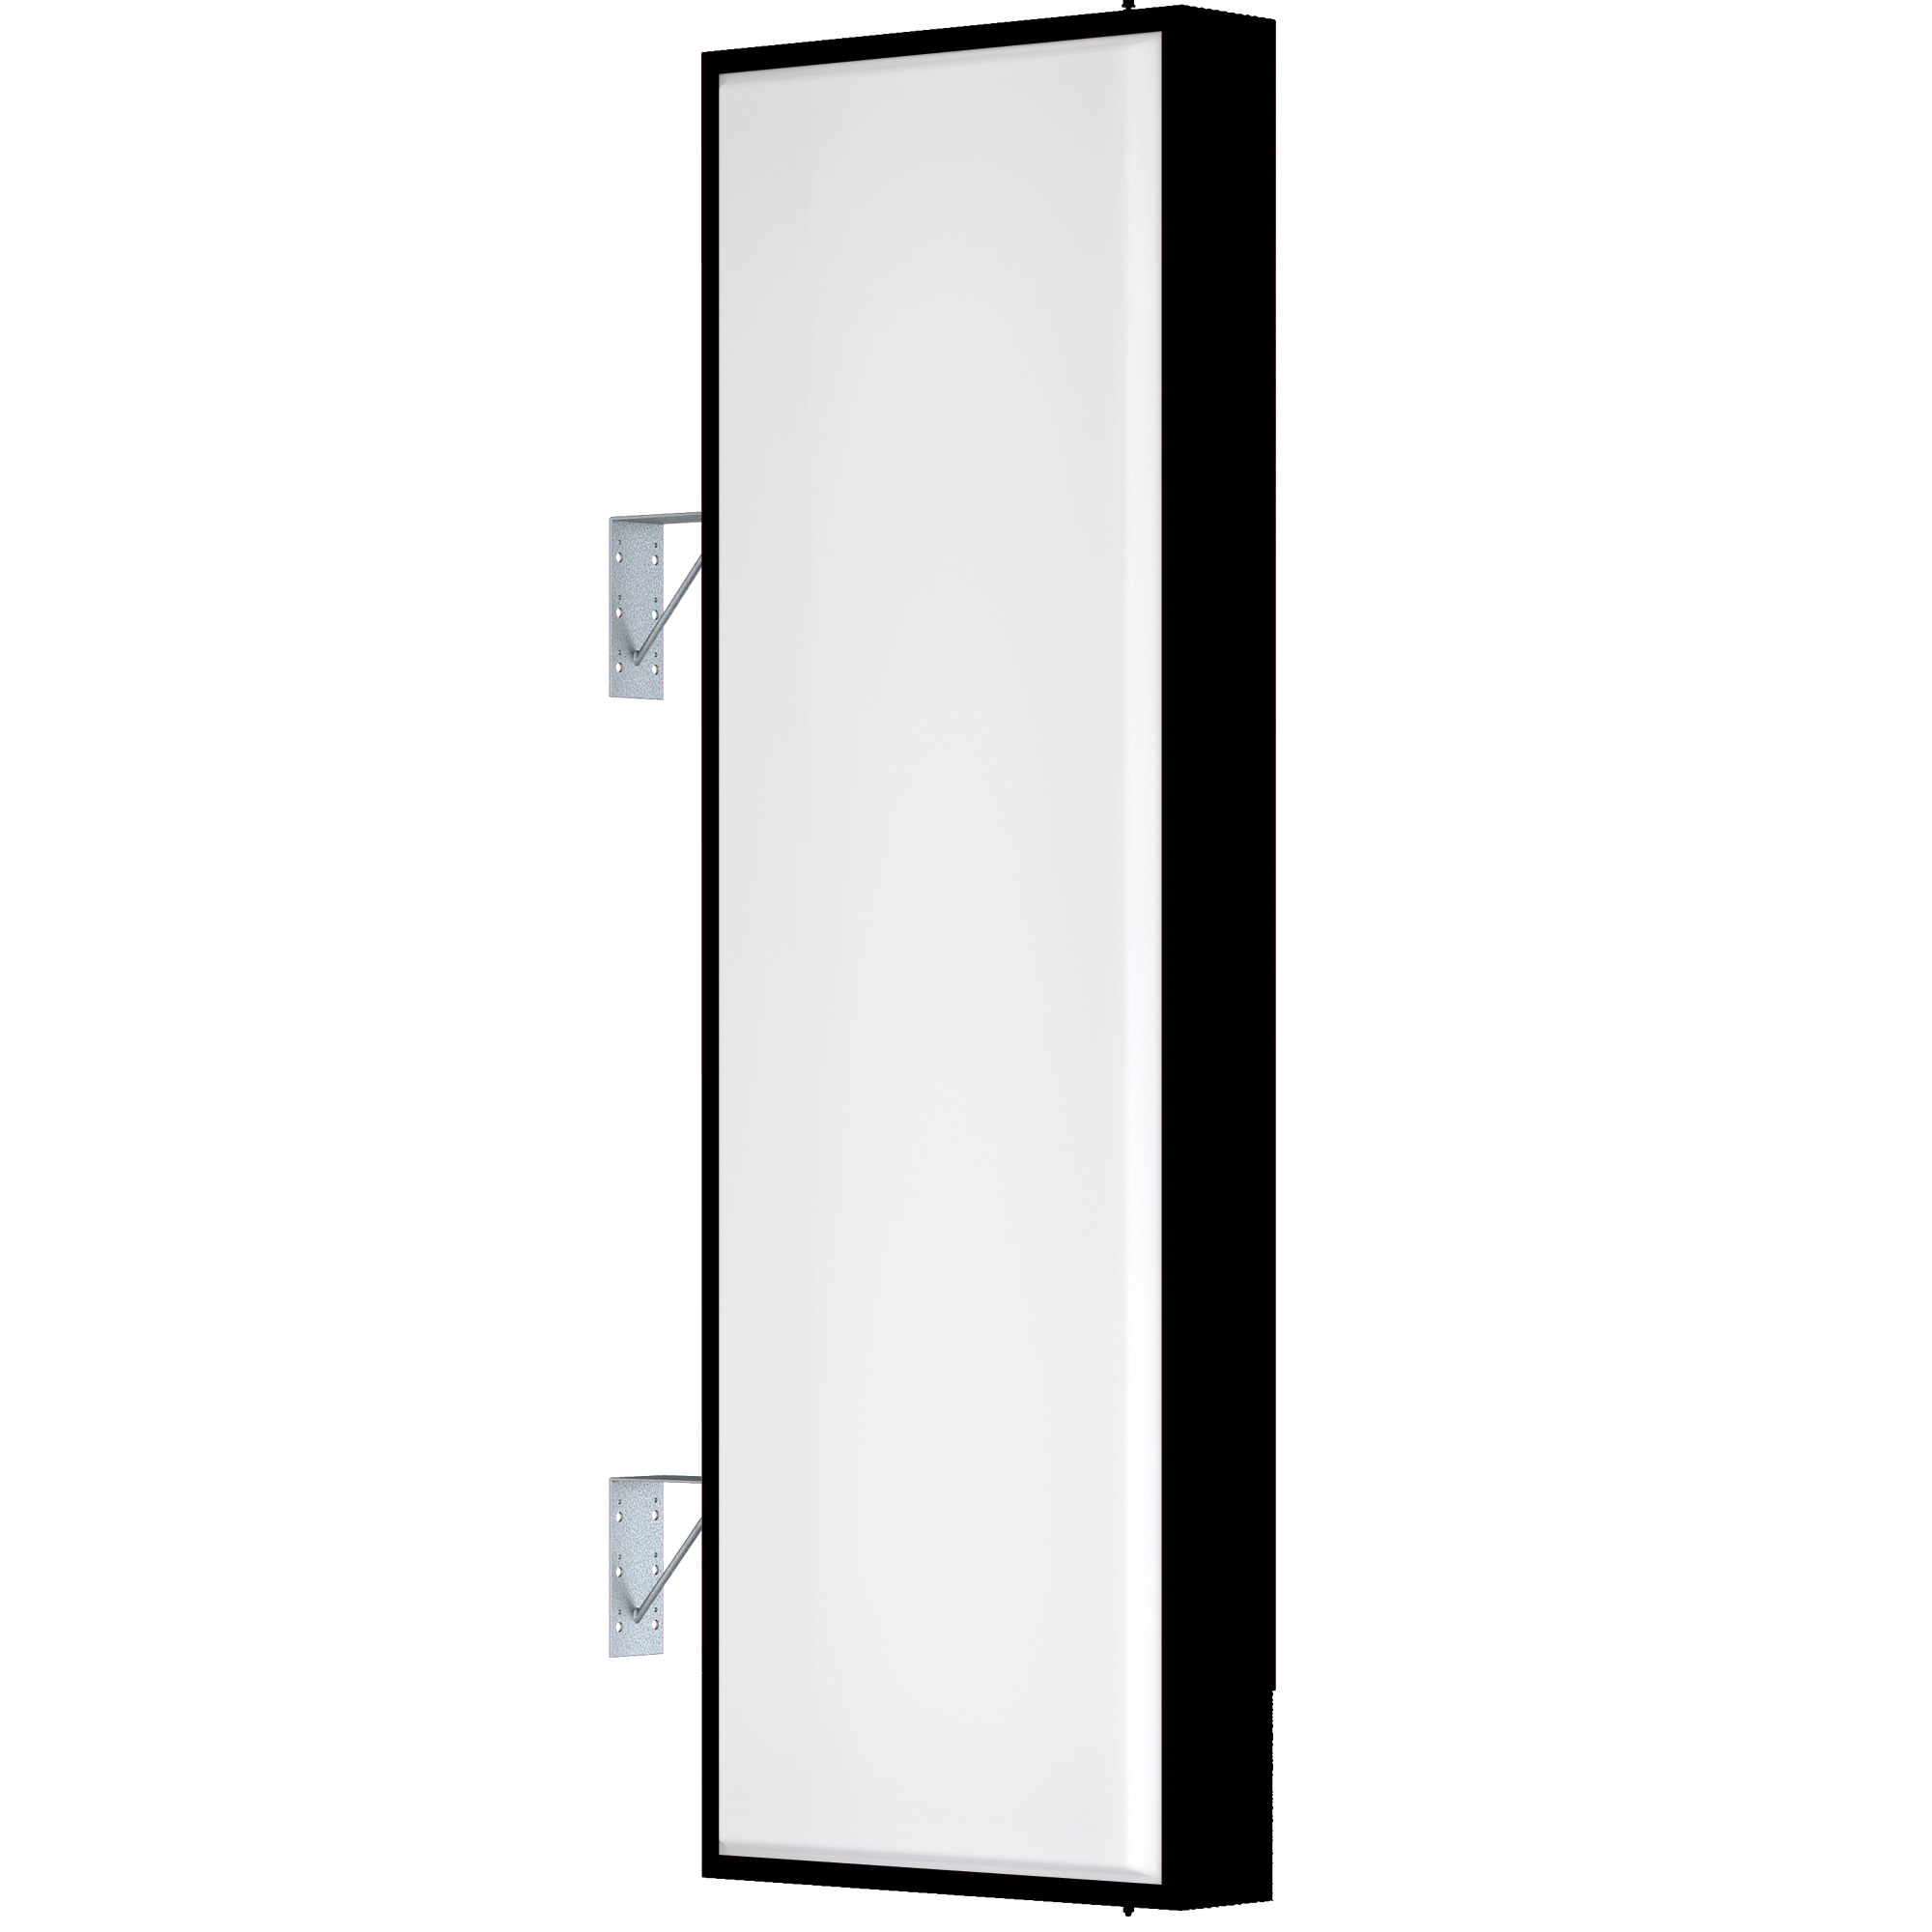 【LED照明】アルミサイン6尺「角」突出し看板AD-6215E-LED ブラック